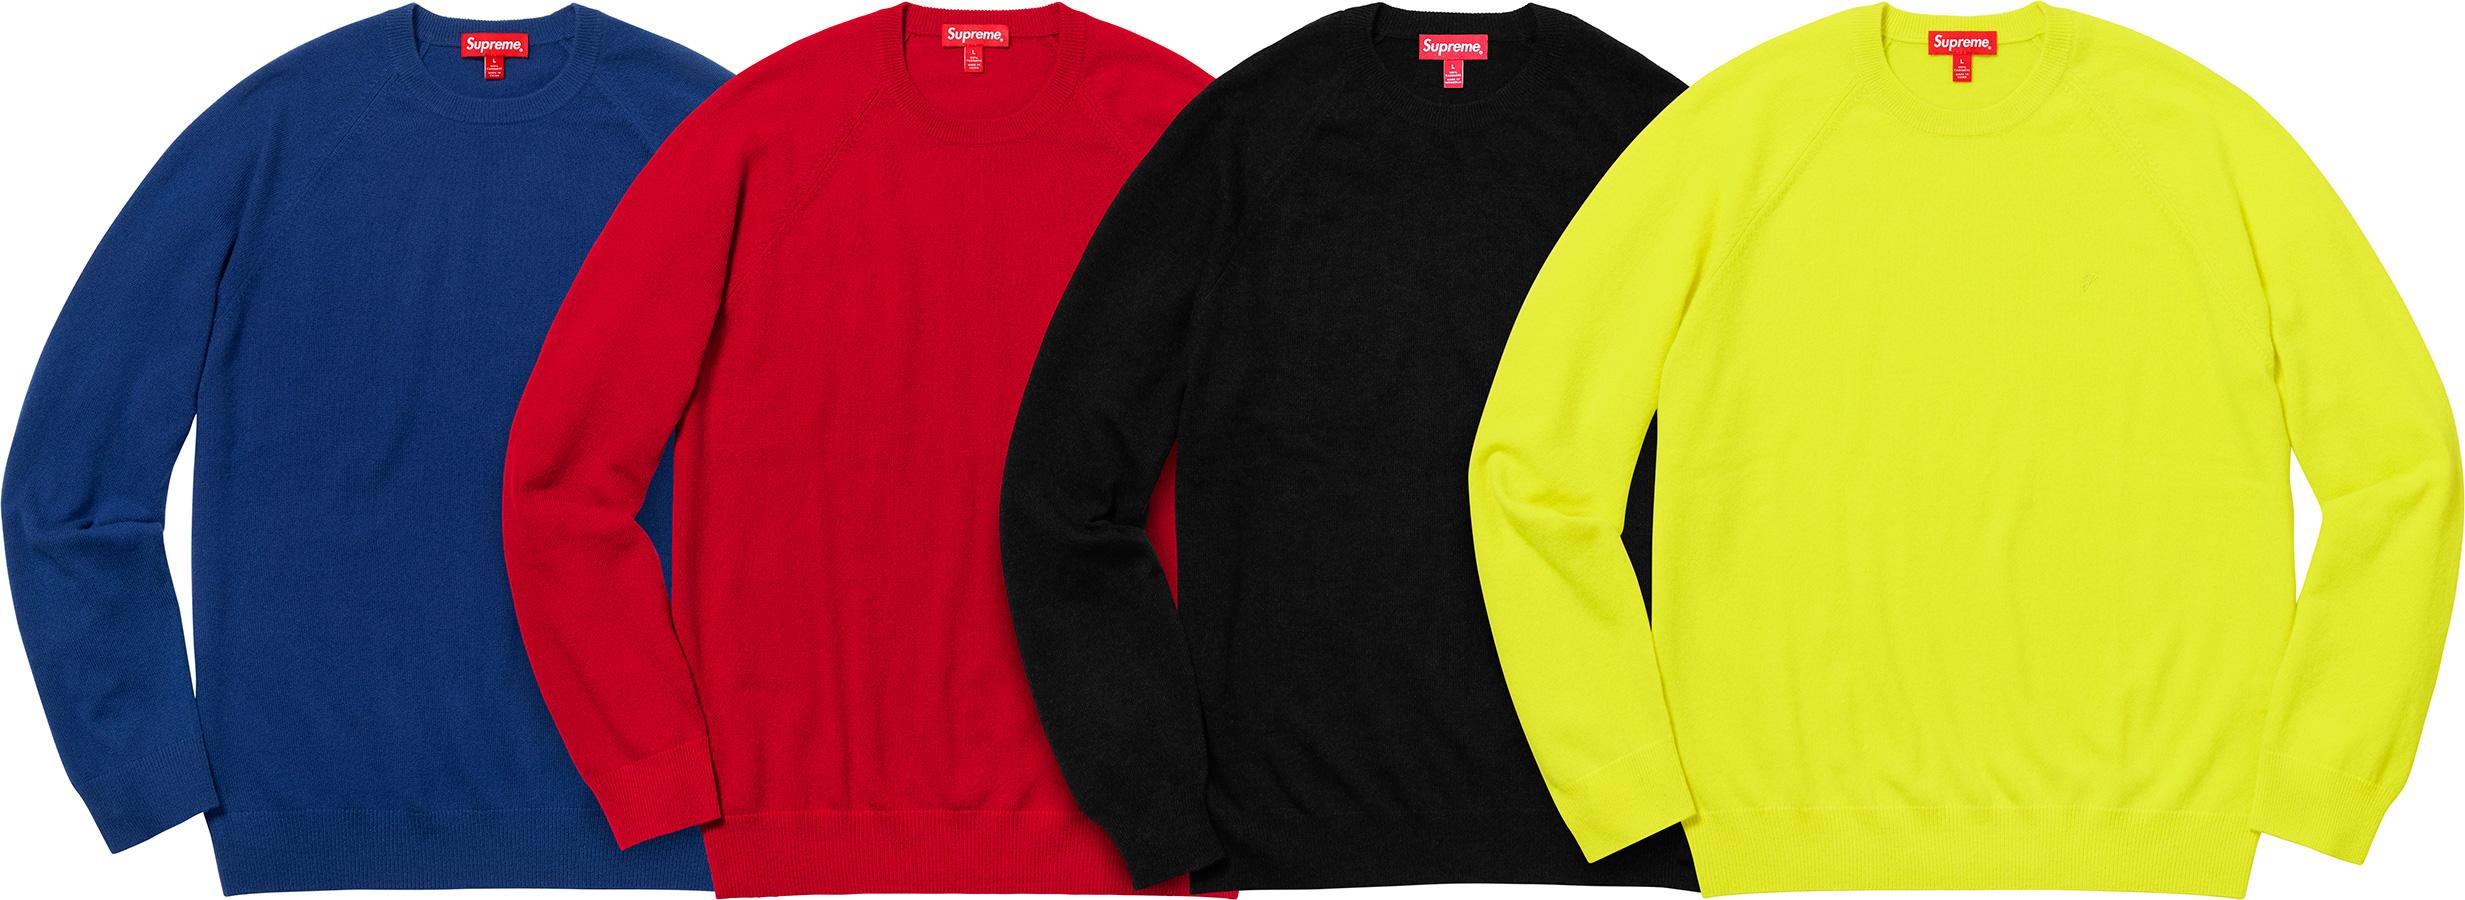 795bf08d6cc6 Details Supreme Cashmere Sweater - Supreme Community